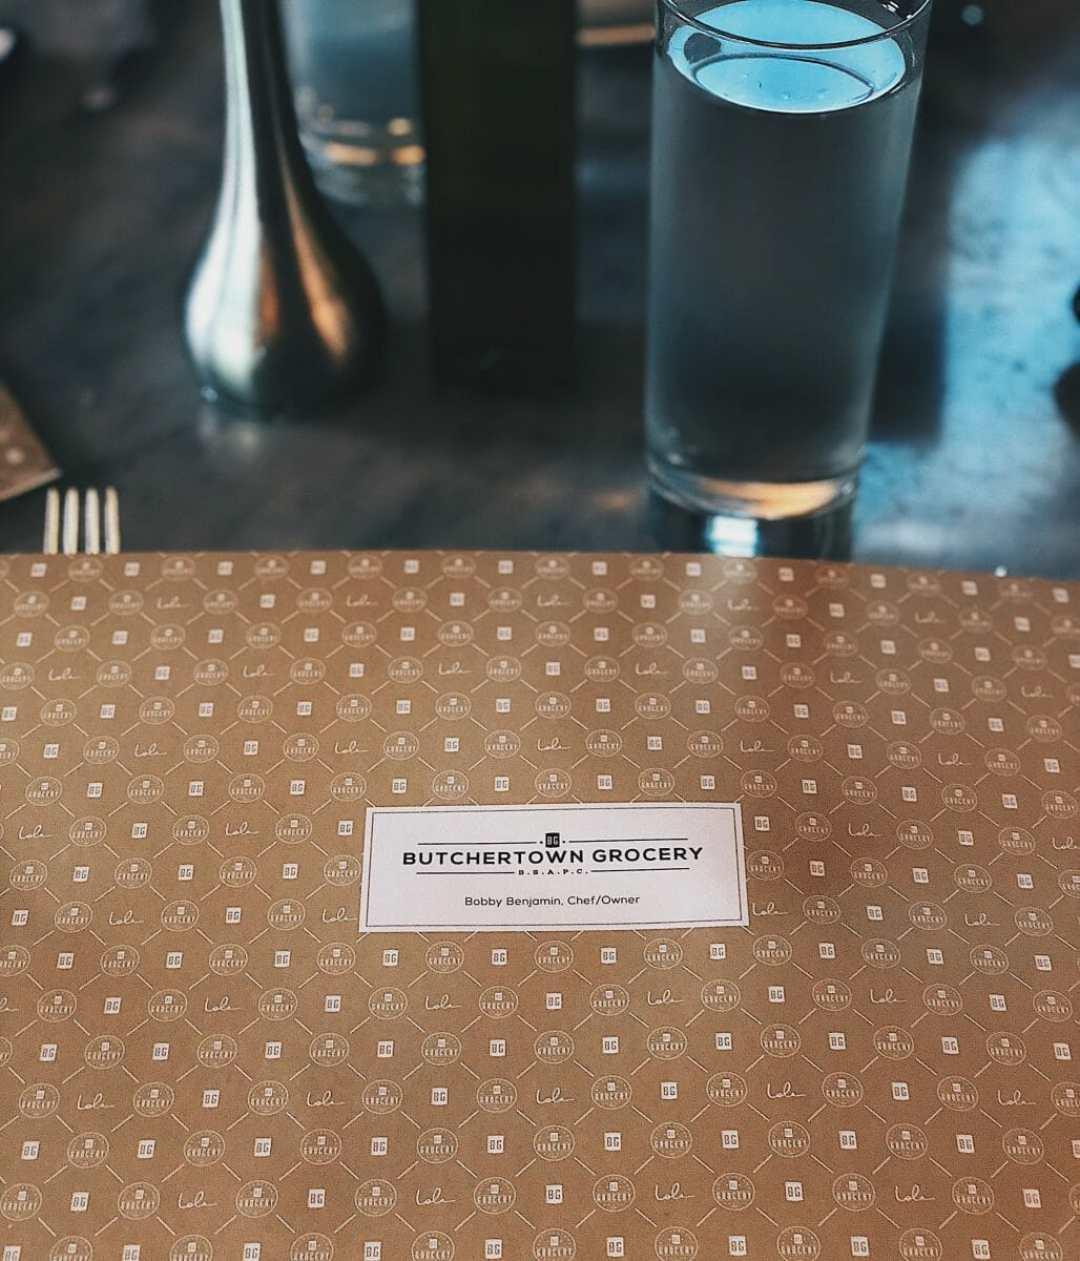 Butchertown-Grocery-Louisville-KY